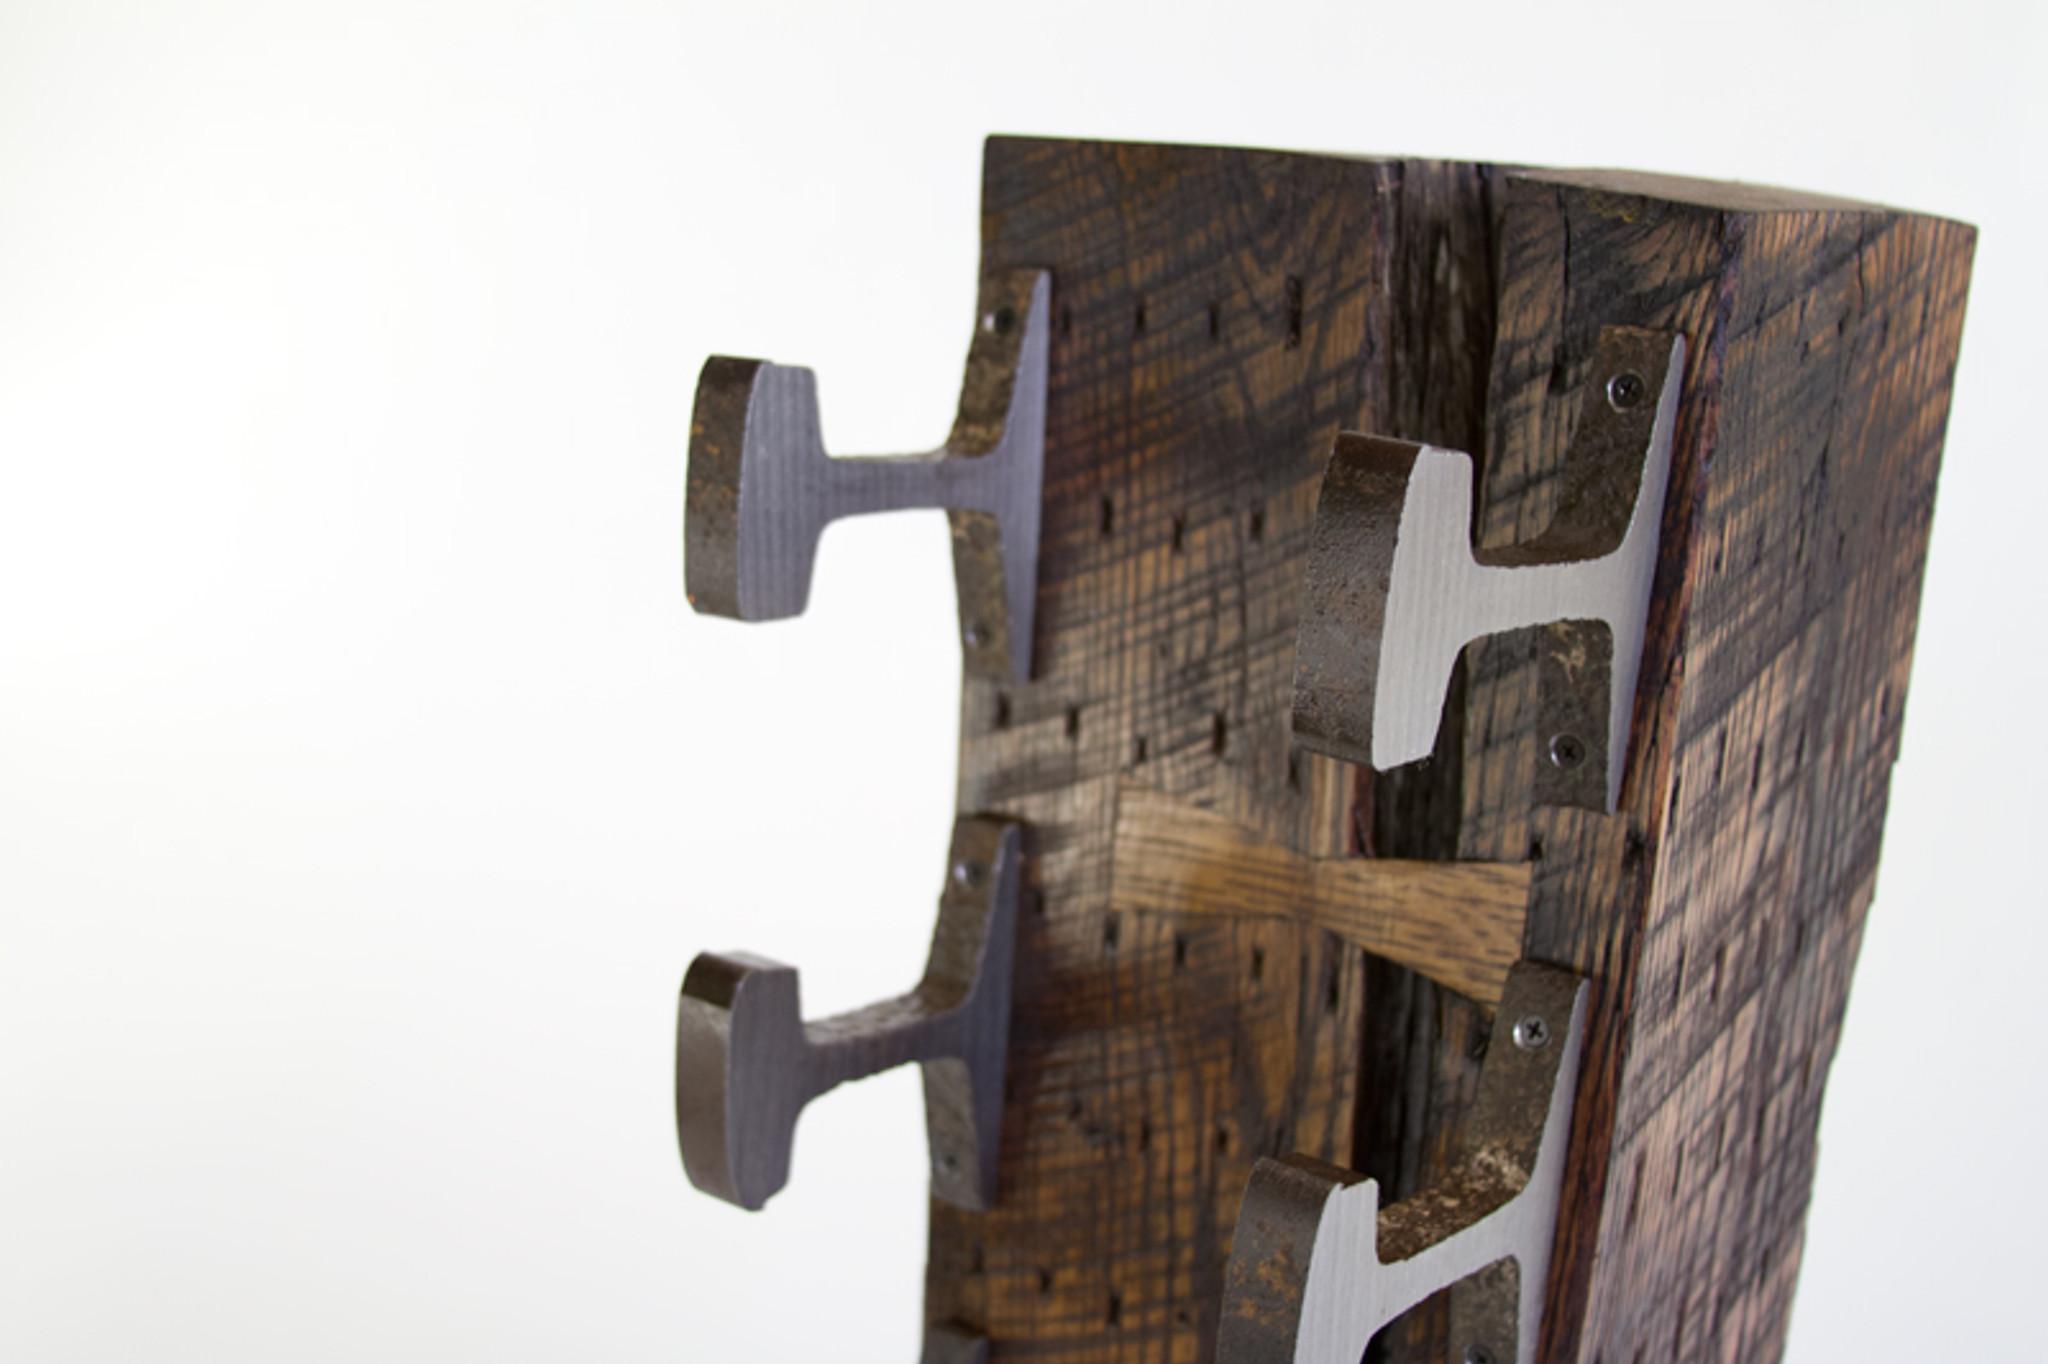 bowtie joinery wine rack detail